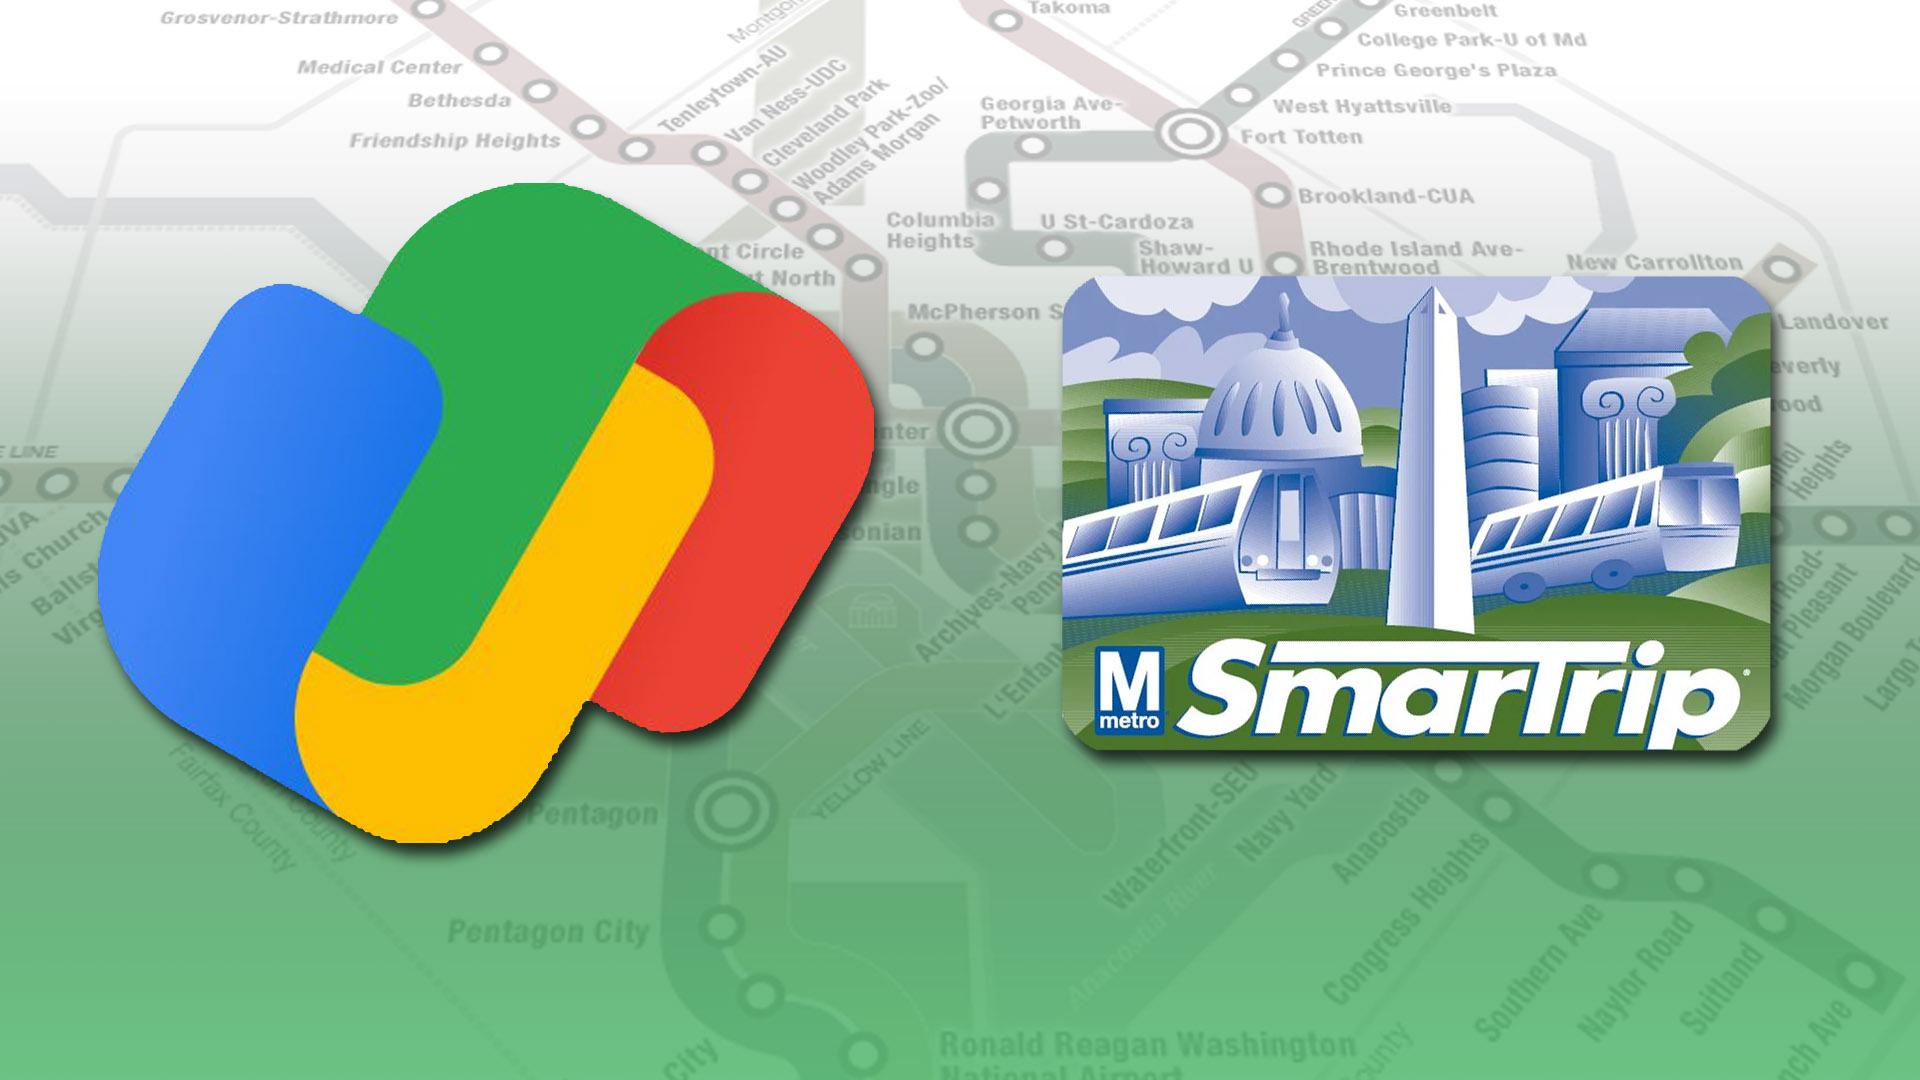 Google Pay now supports Washington DC Metro travel passes